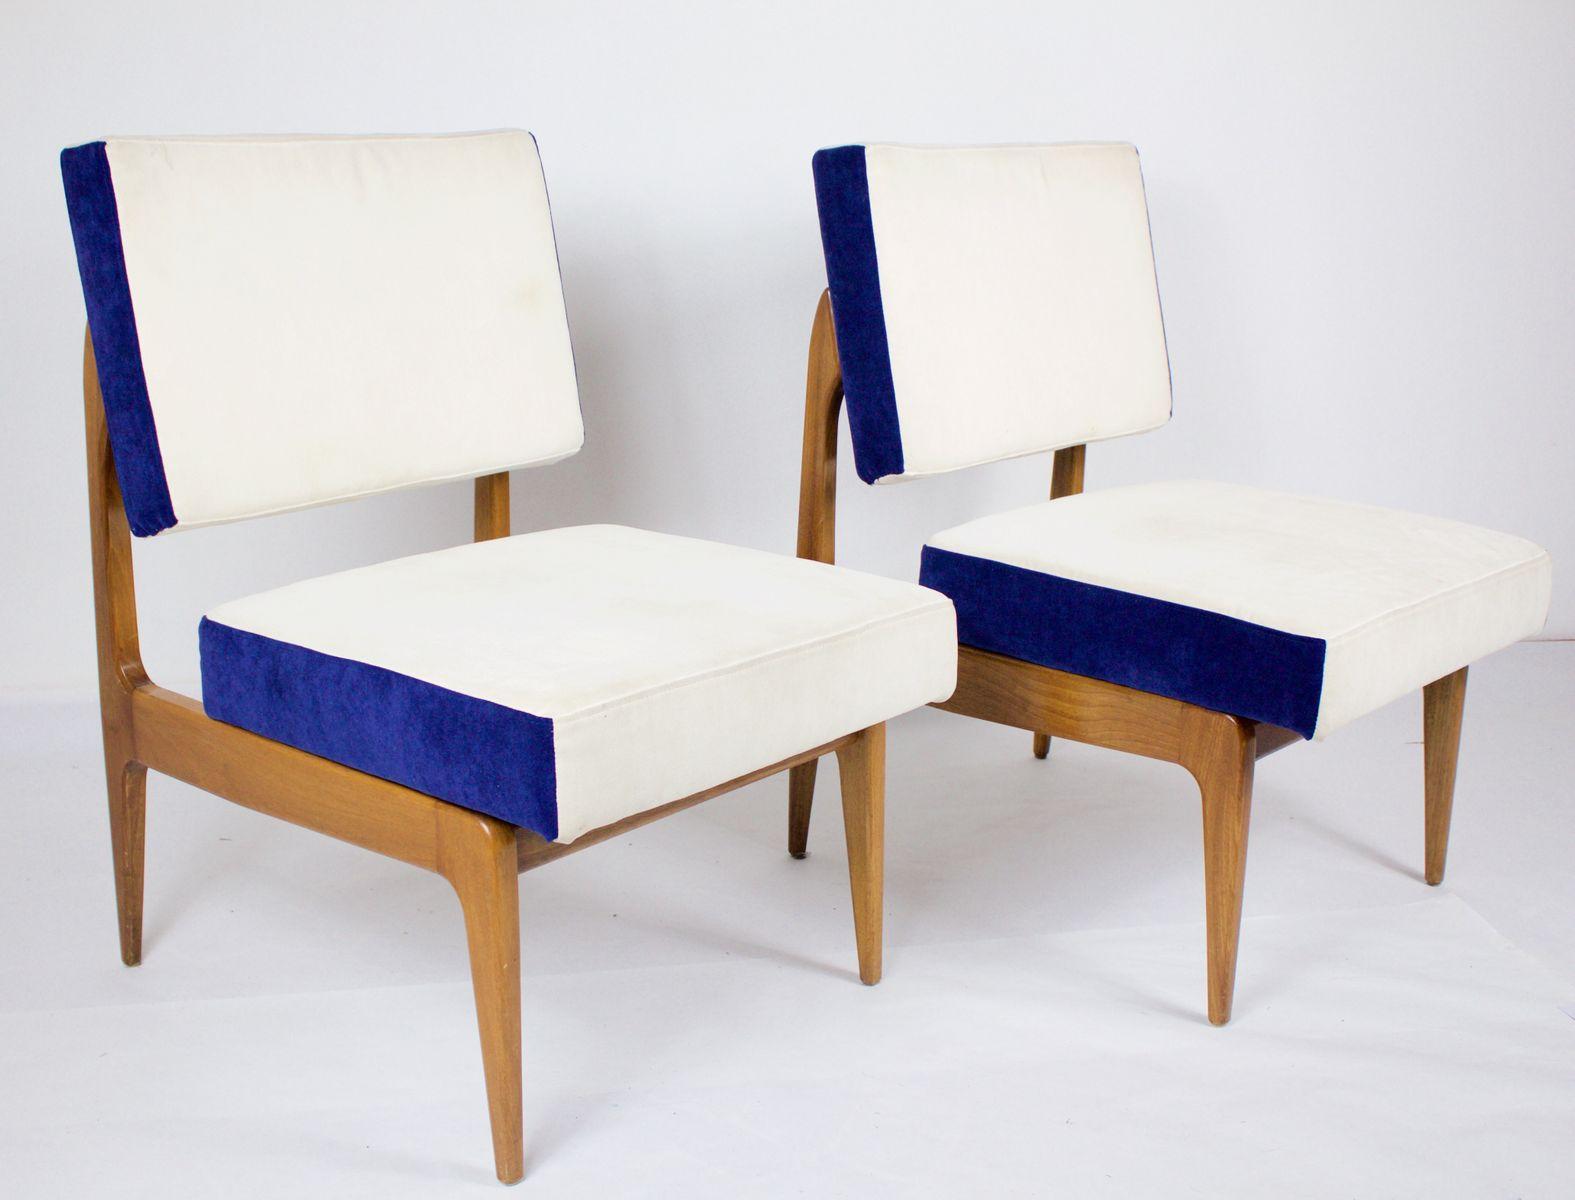 italienische st hle 1960er 2er set bei pamono kaufen. Black Bedroom Furniture Sets. Home Design Ideas